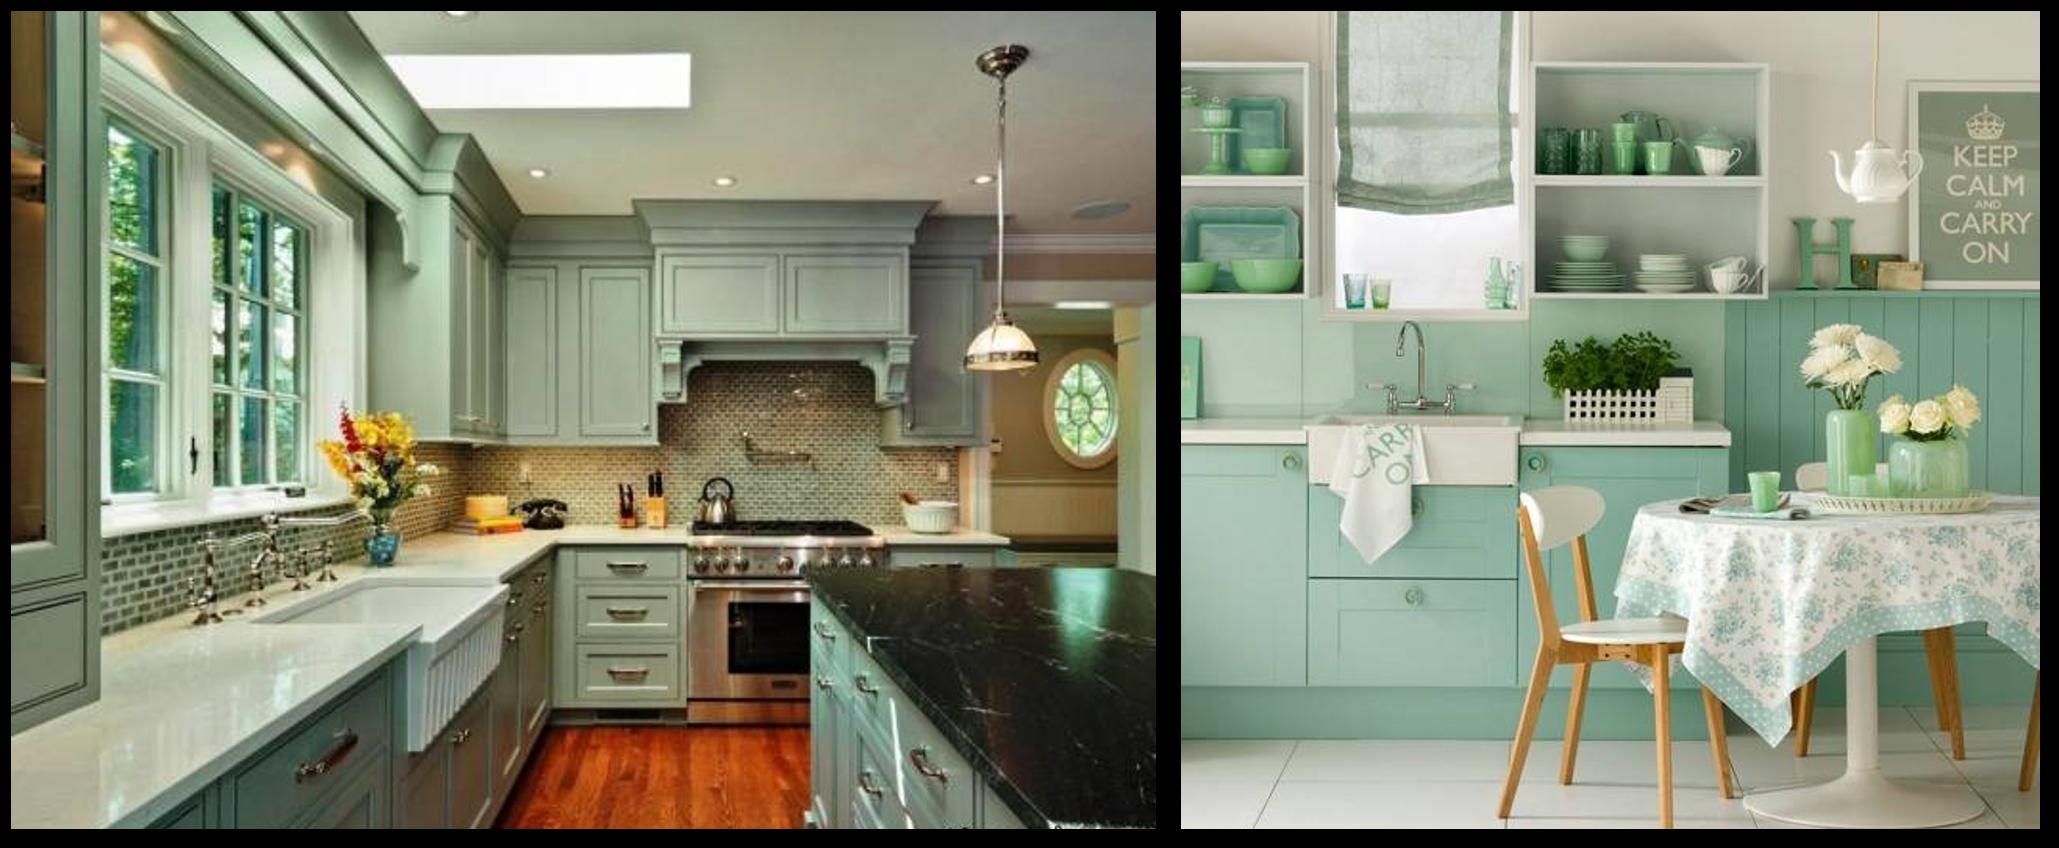 کابینت آشپزخانه سبز آبی